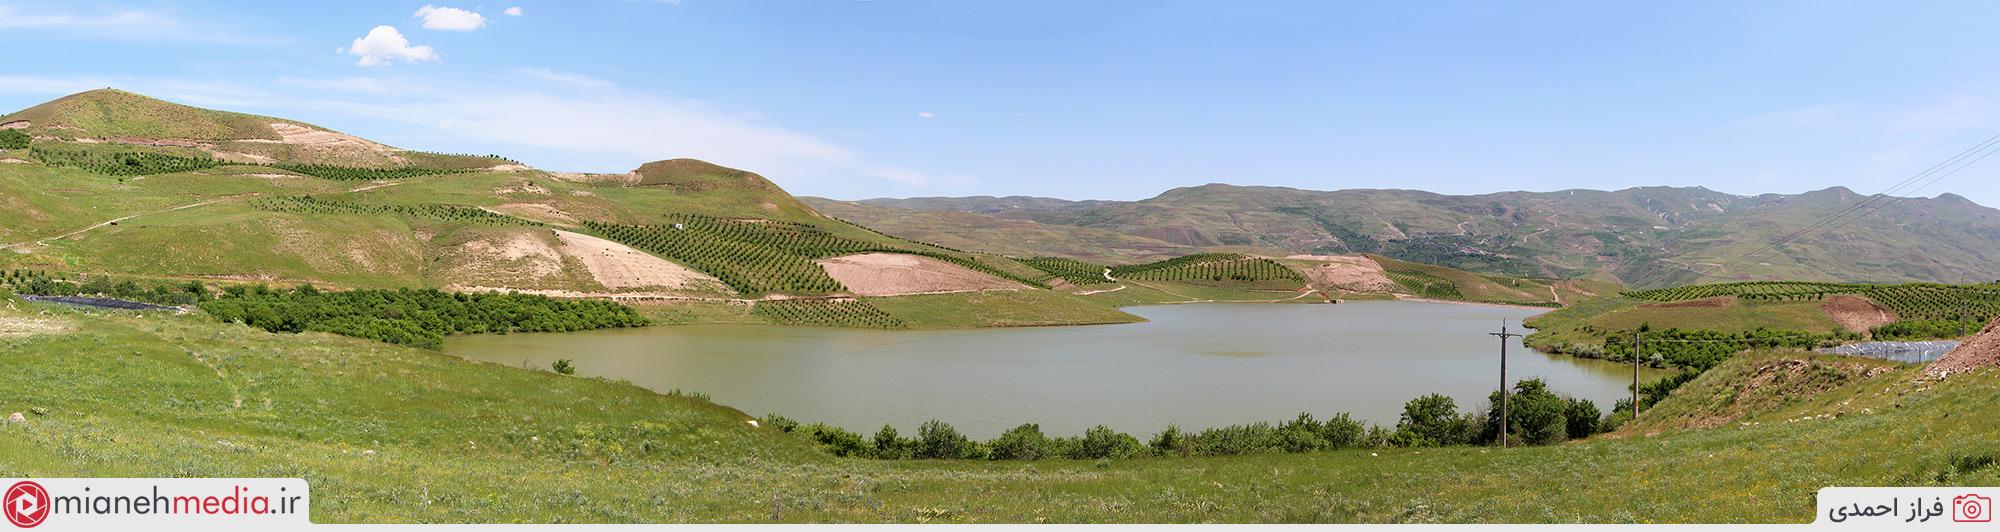 سد روستای توشمانلو